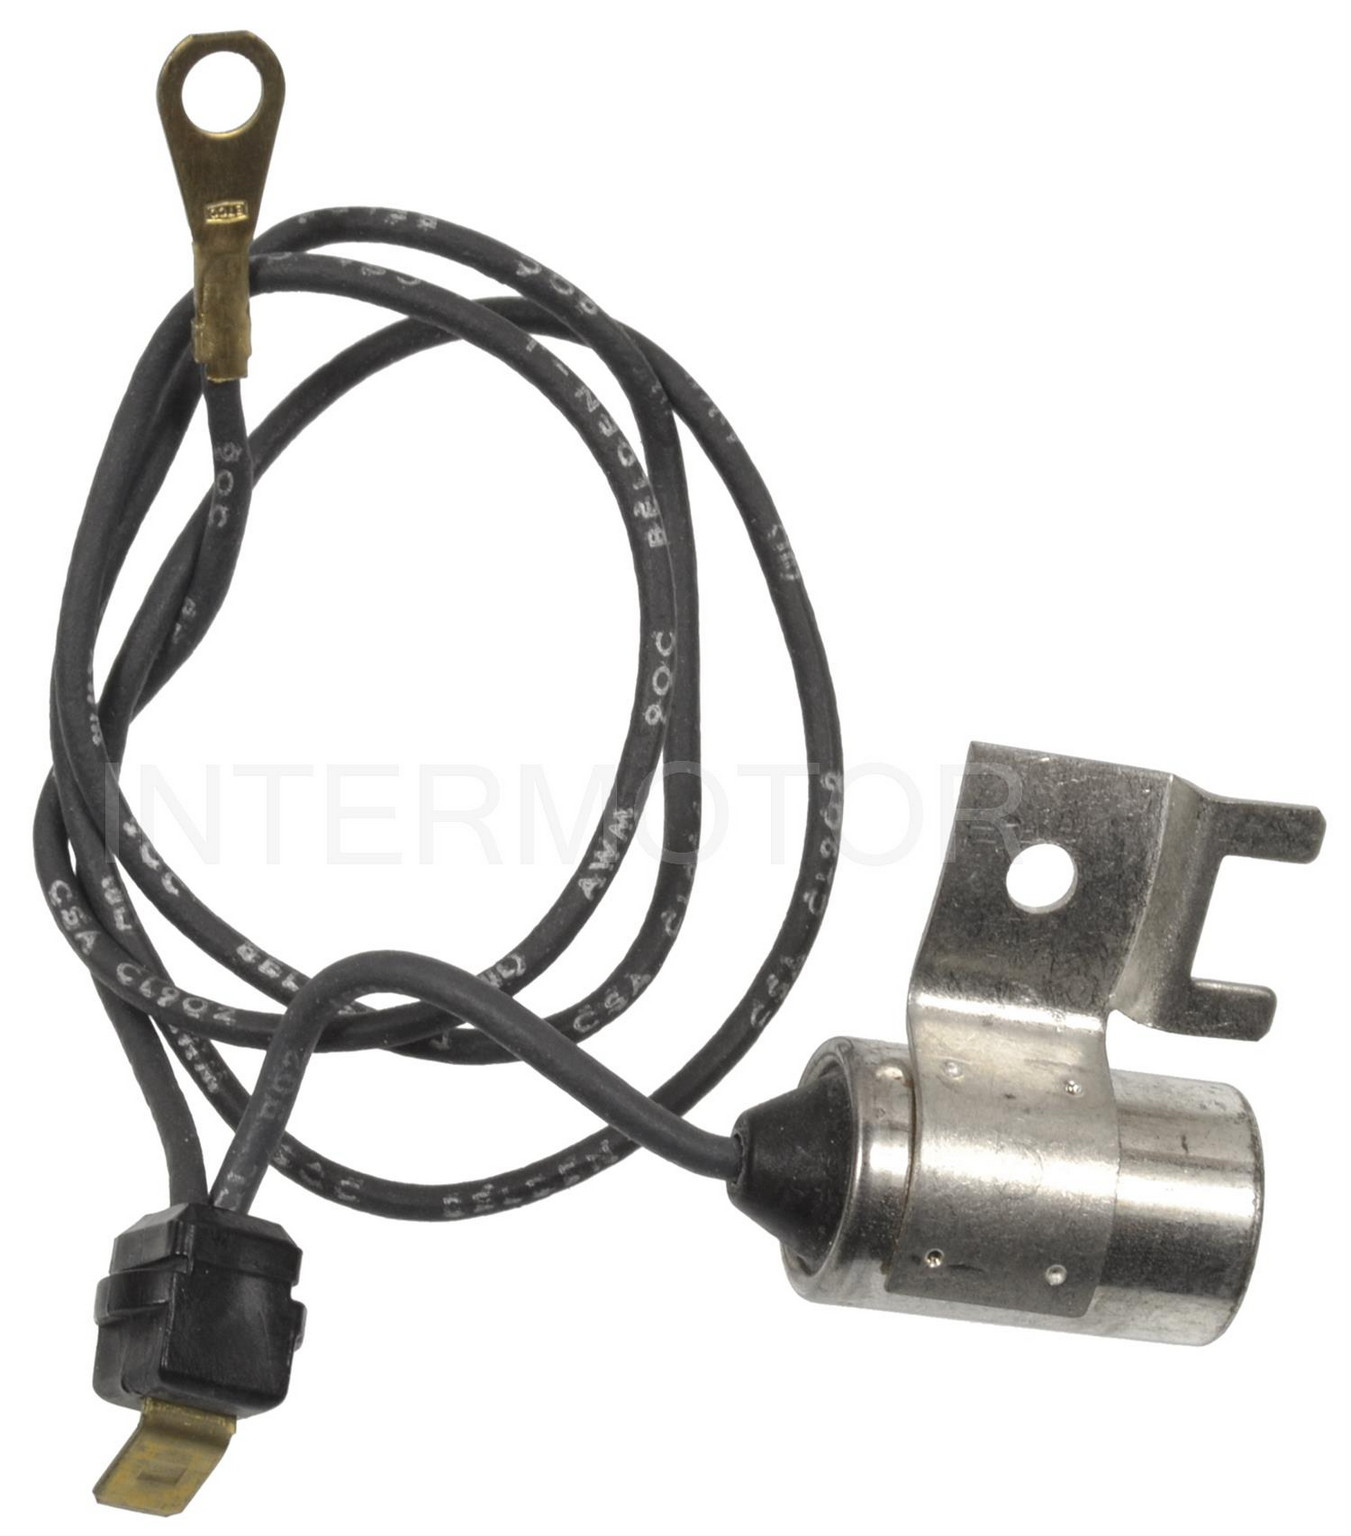 Mercedes Saloon W123 200 Genuine Intermotor Ignition Condenser Replacement